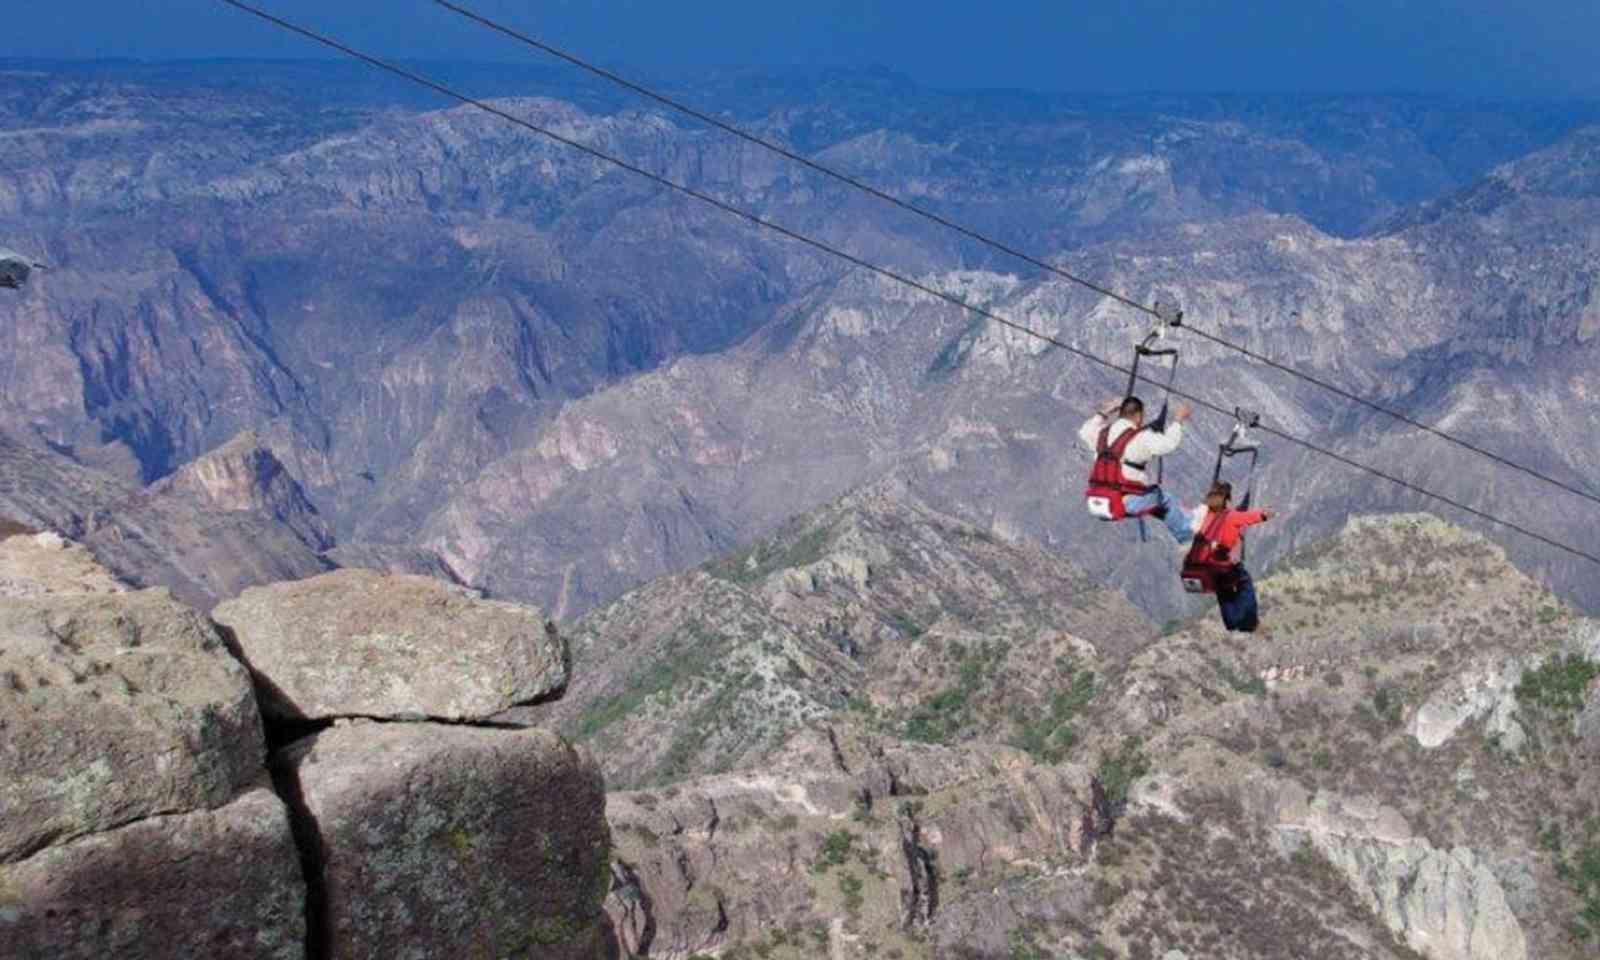 Ziplining across the Copper Canyon (parquebarrancas.com)